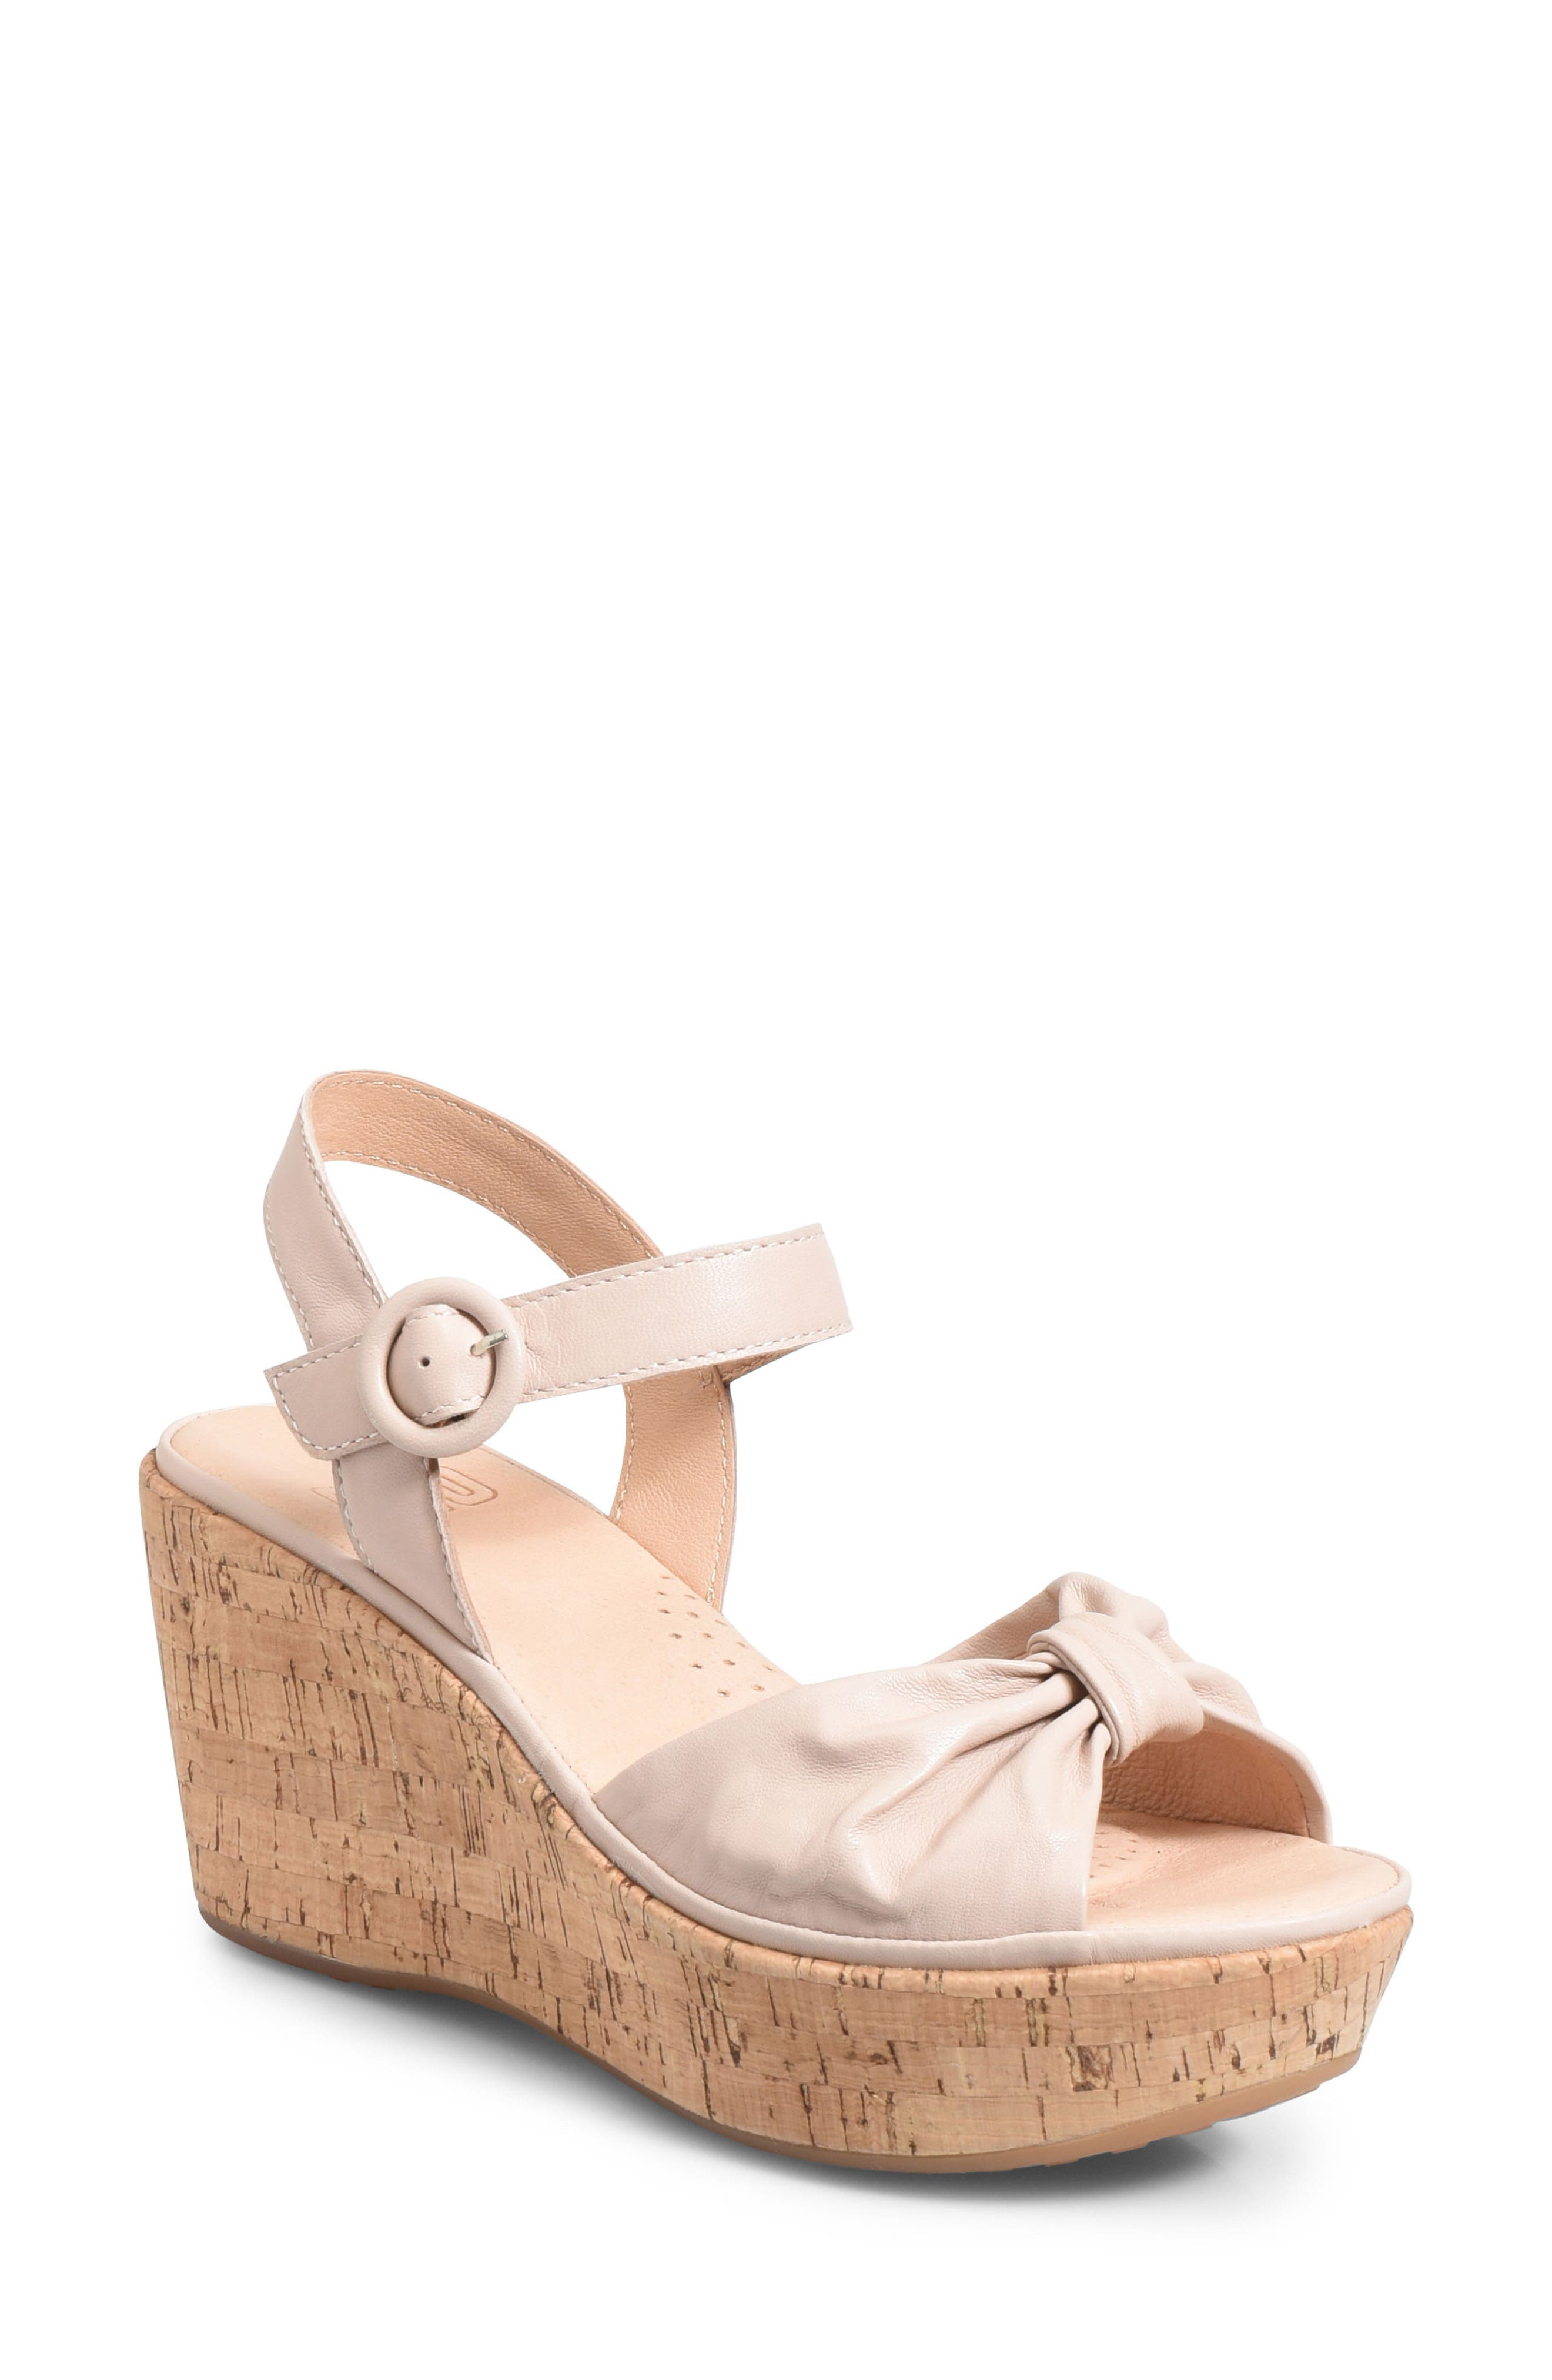 Ono Heavenly Platform Wedge Sandal, Pink